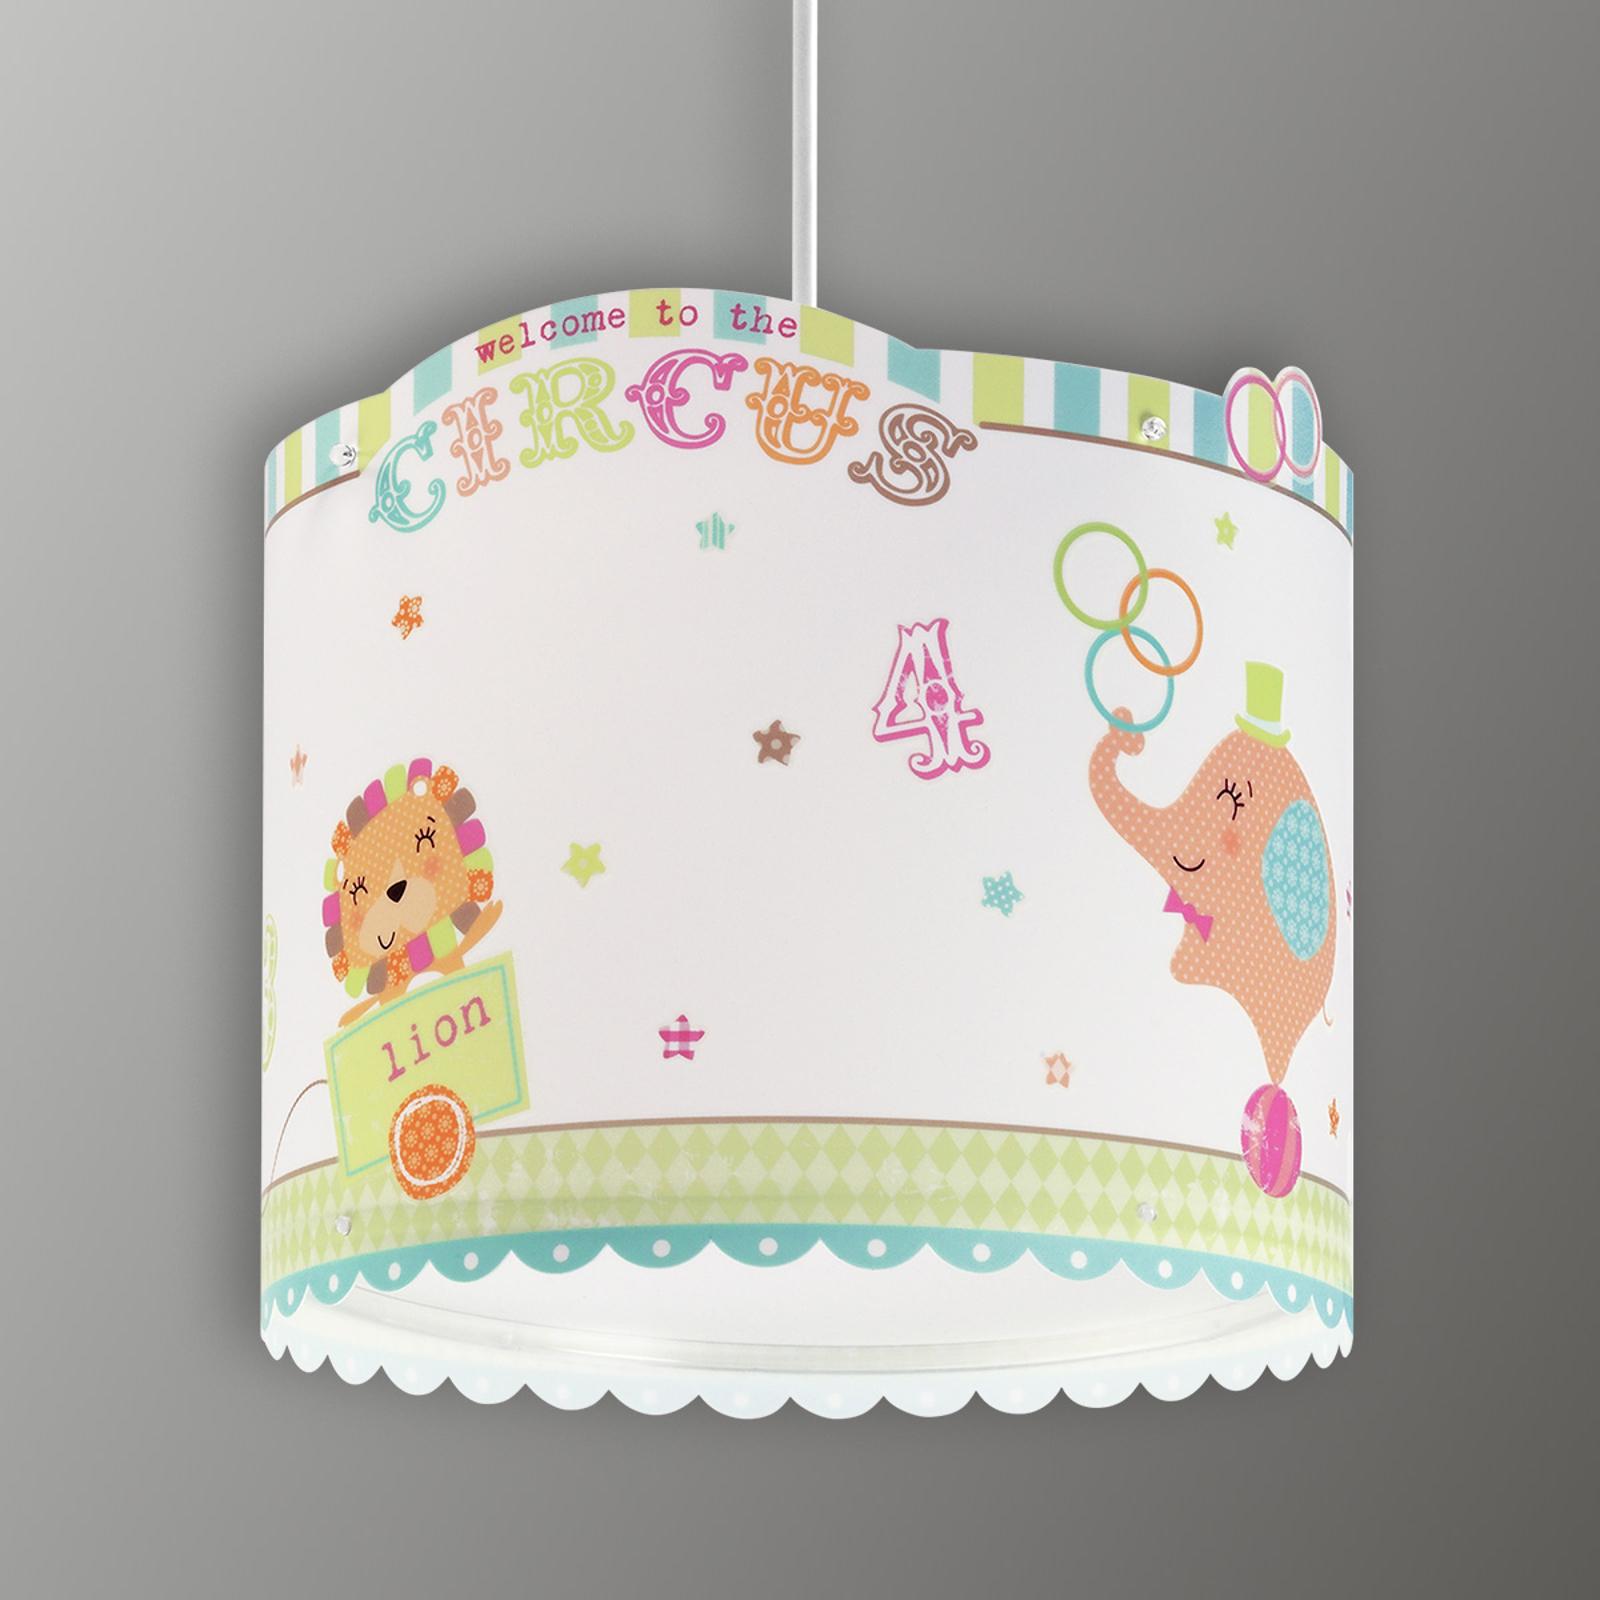 Circus - allegra lampada a sospensione per bimbi